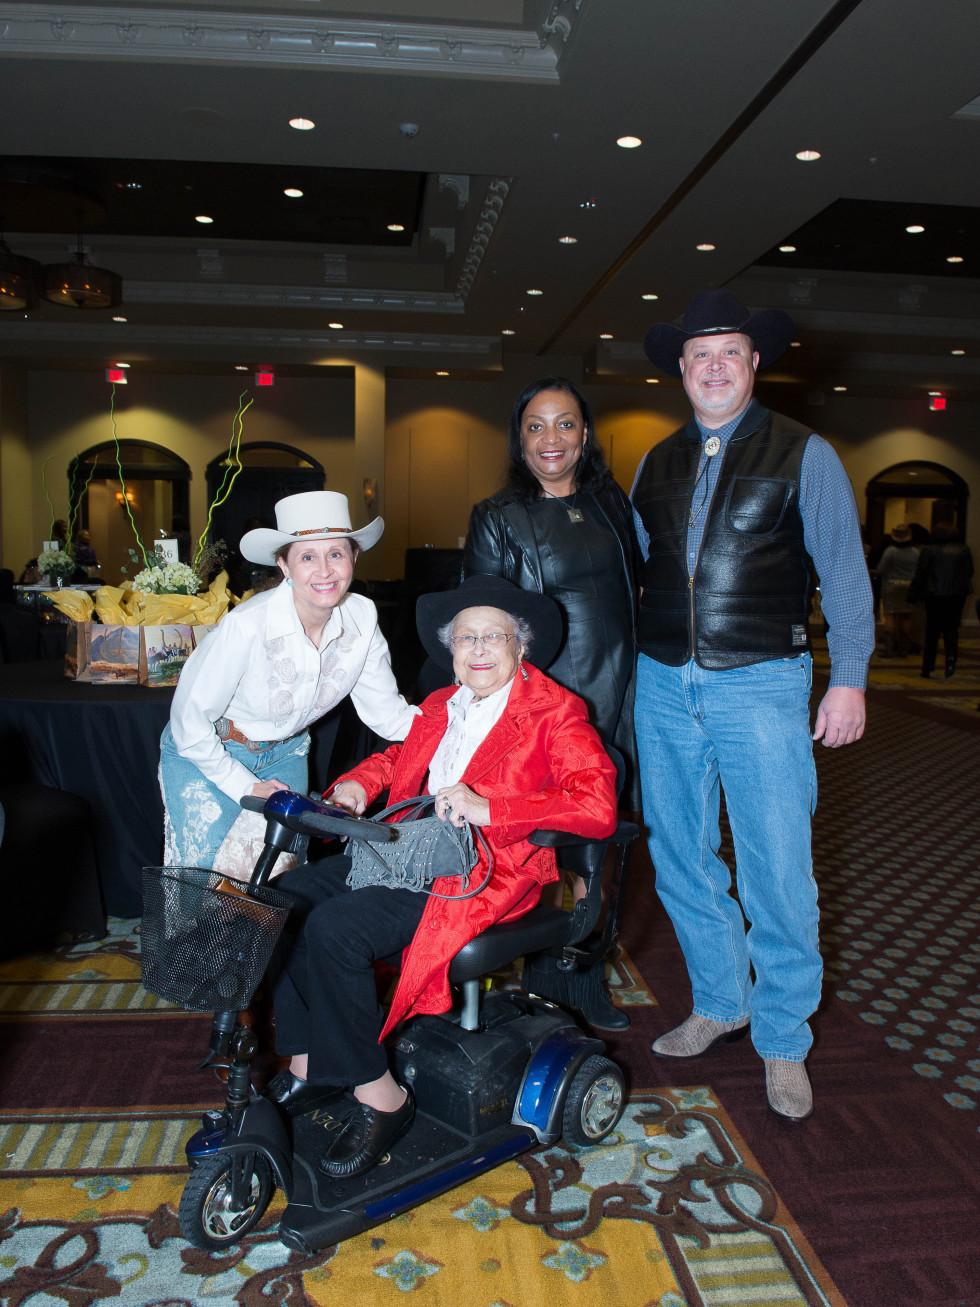 Boots and Bling Barbara L. Seymour, Barbara Y. Seymour, Anya and Leroy Seymour